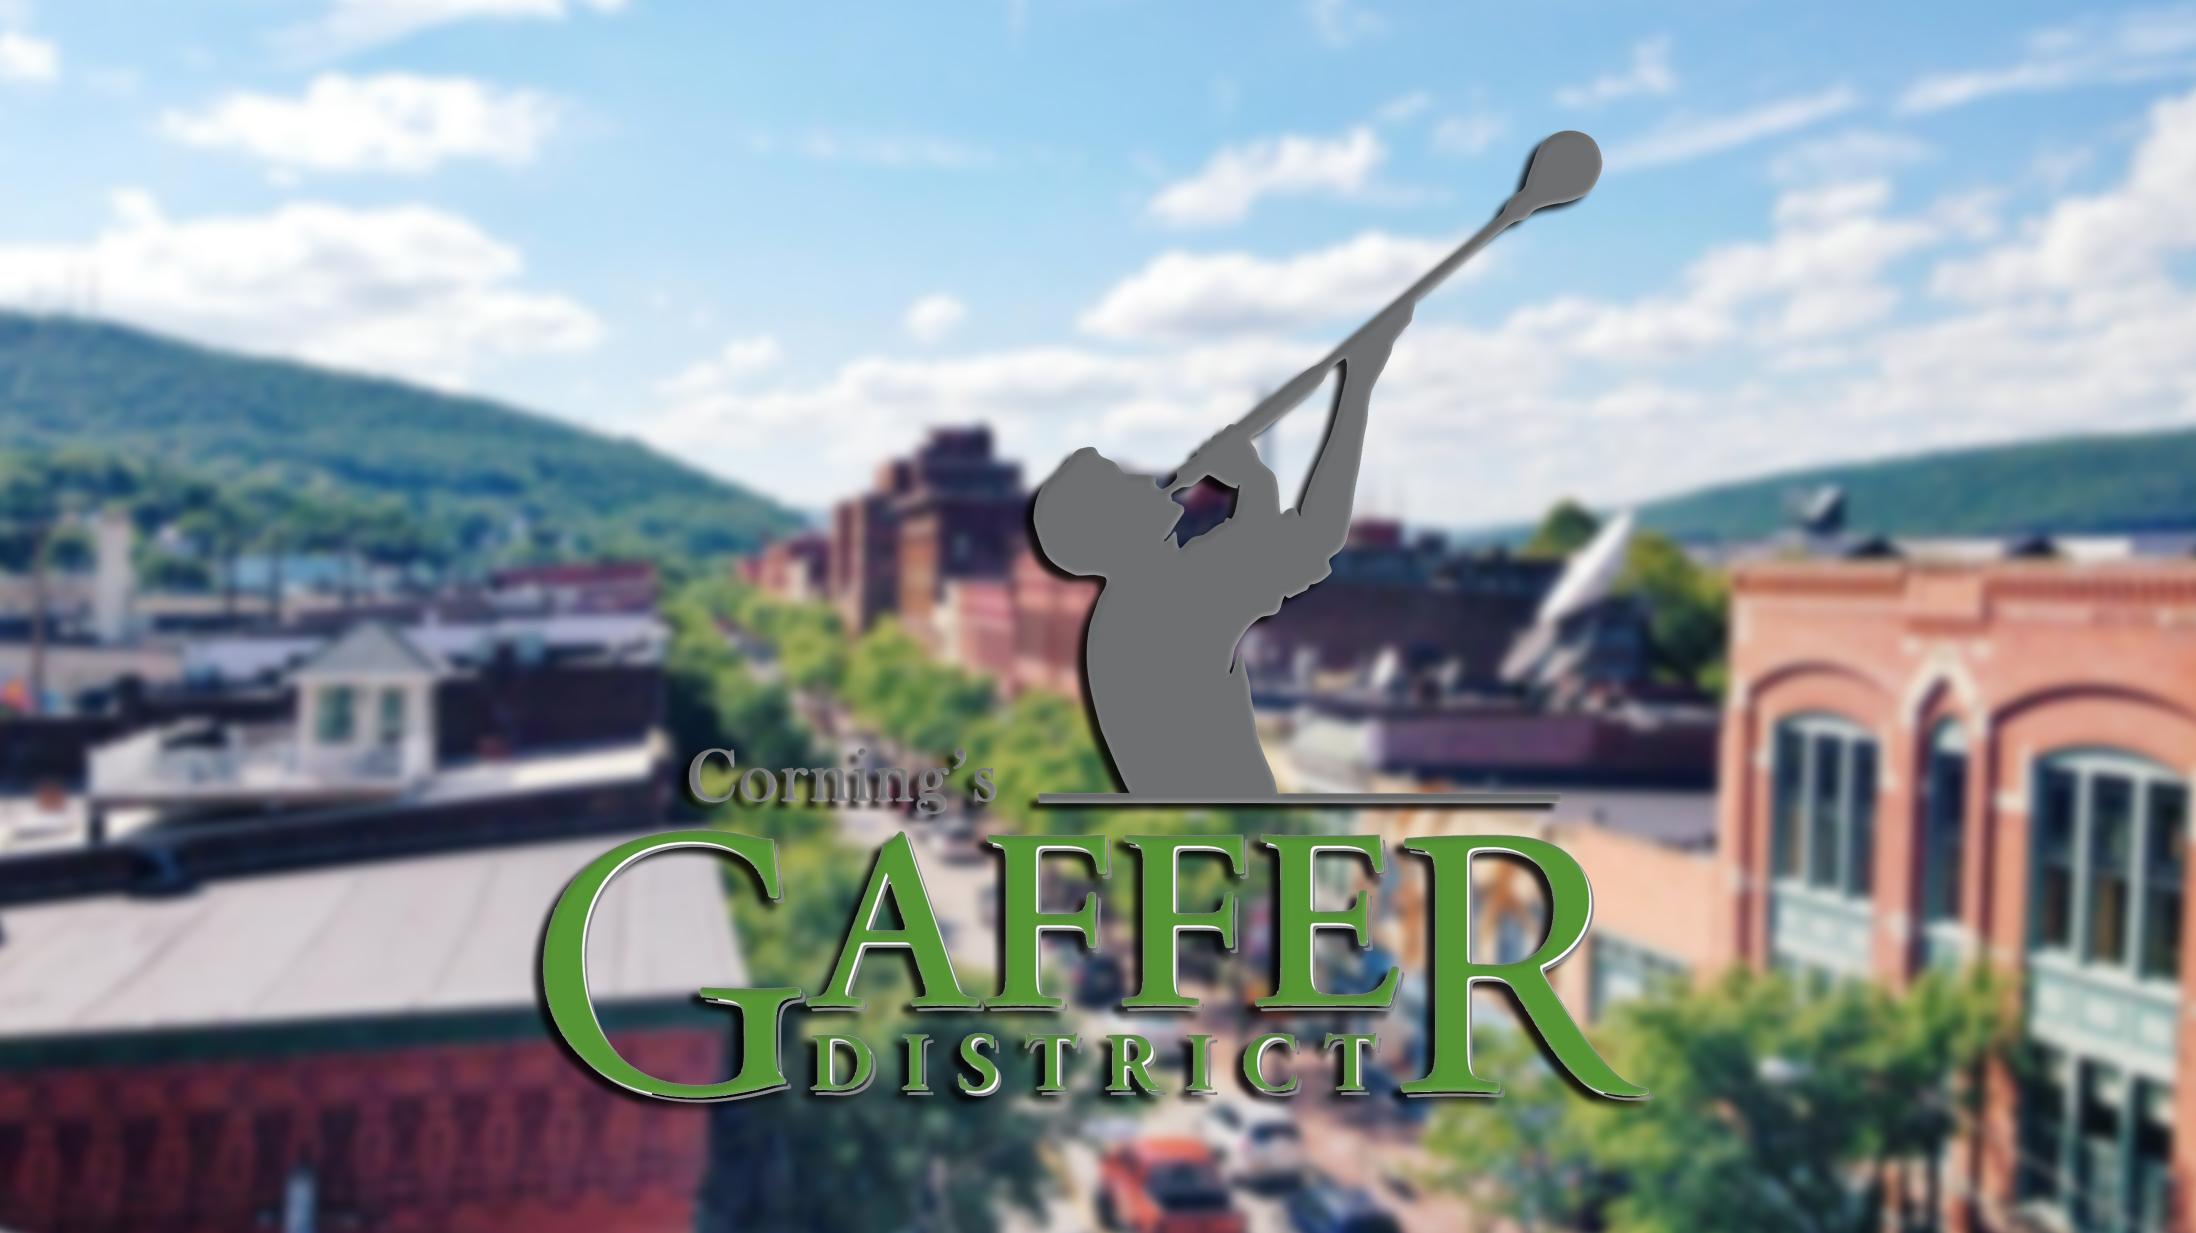 Corning Gaffer District FOR WEB_1457739302069.jpg